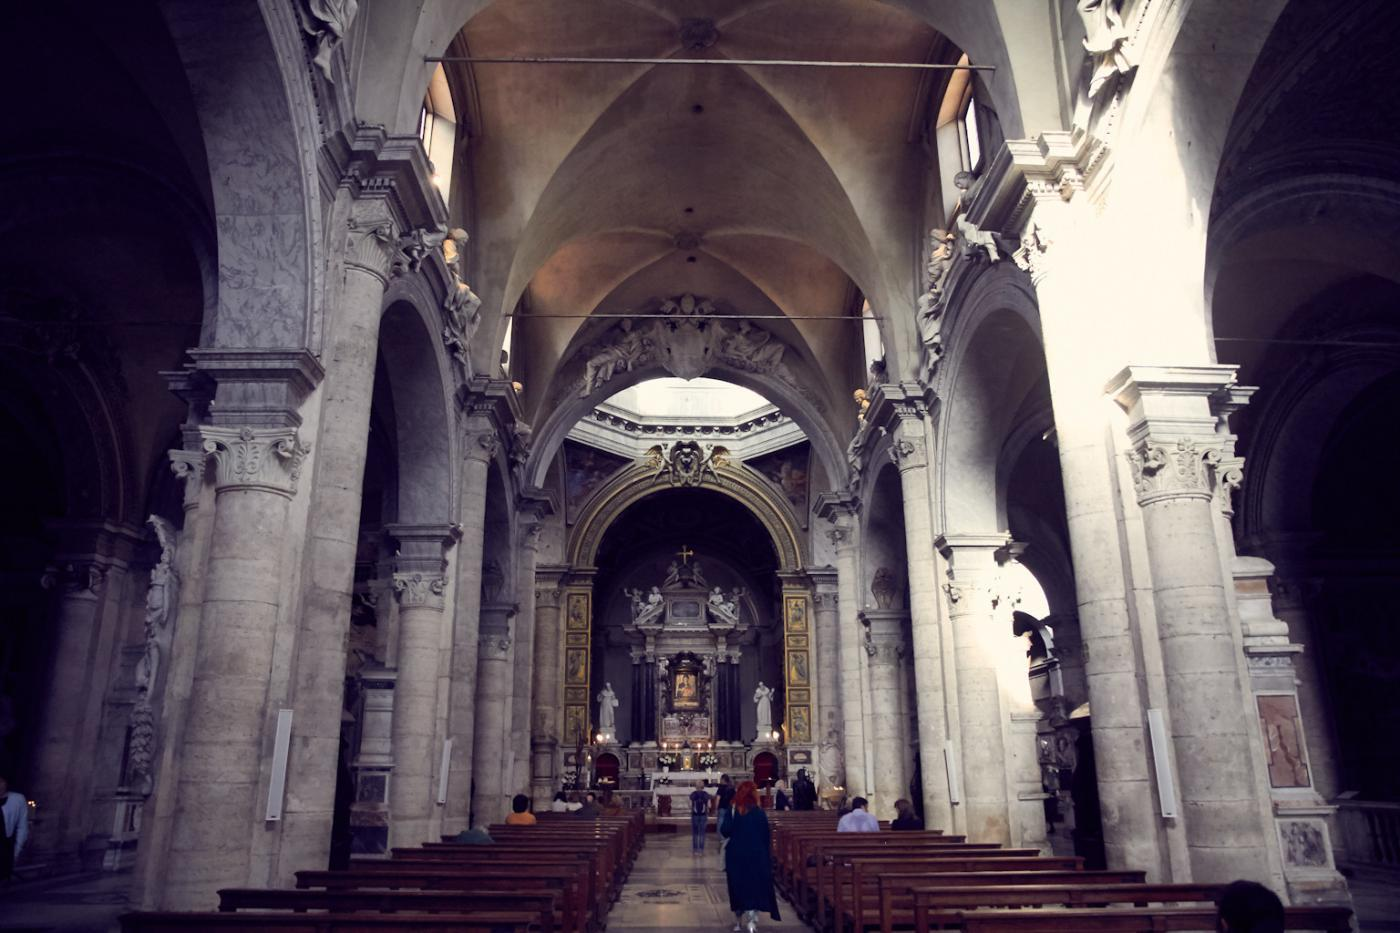 Rom, Rome, Italien, italy, Santa Maria del Popolo, Kirche, Kirchenschiff, Mittelschiff, Altar, schönheit, Citytrip, Rome, Must See, Reiseblogger